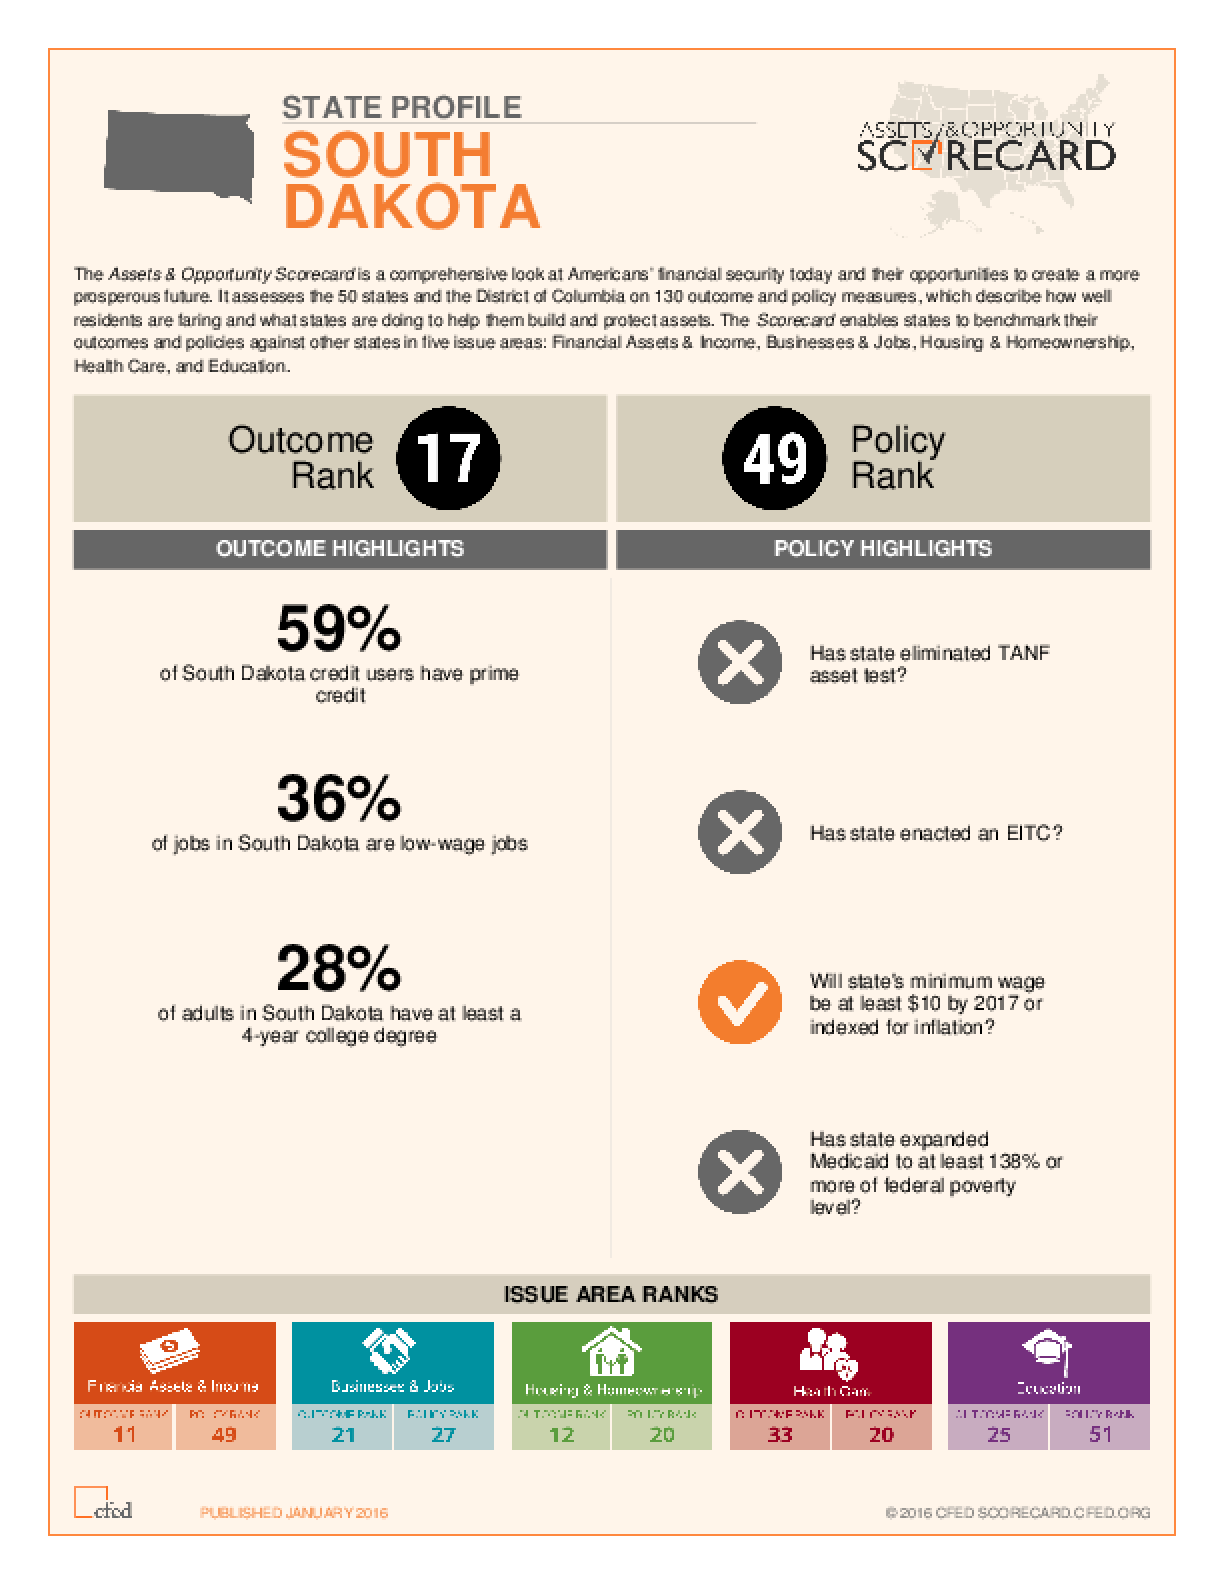 State Profile South Dakota: Assets and Opportunity Scorecard